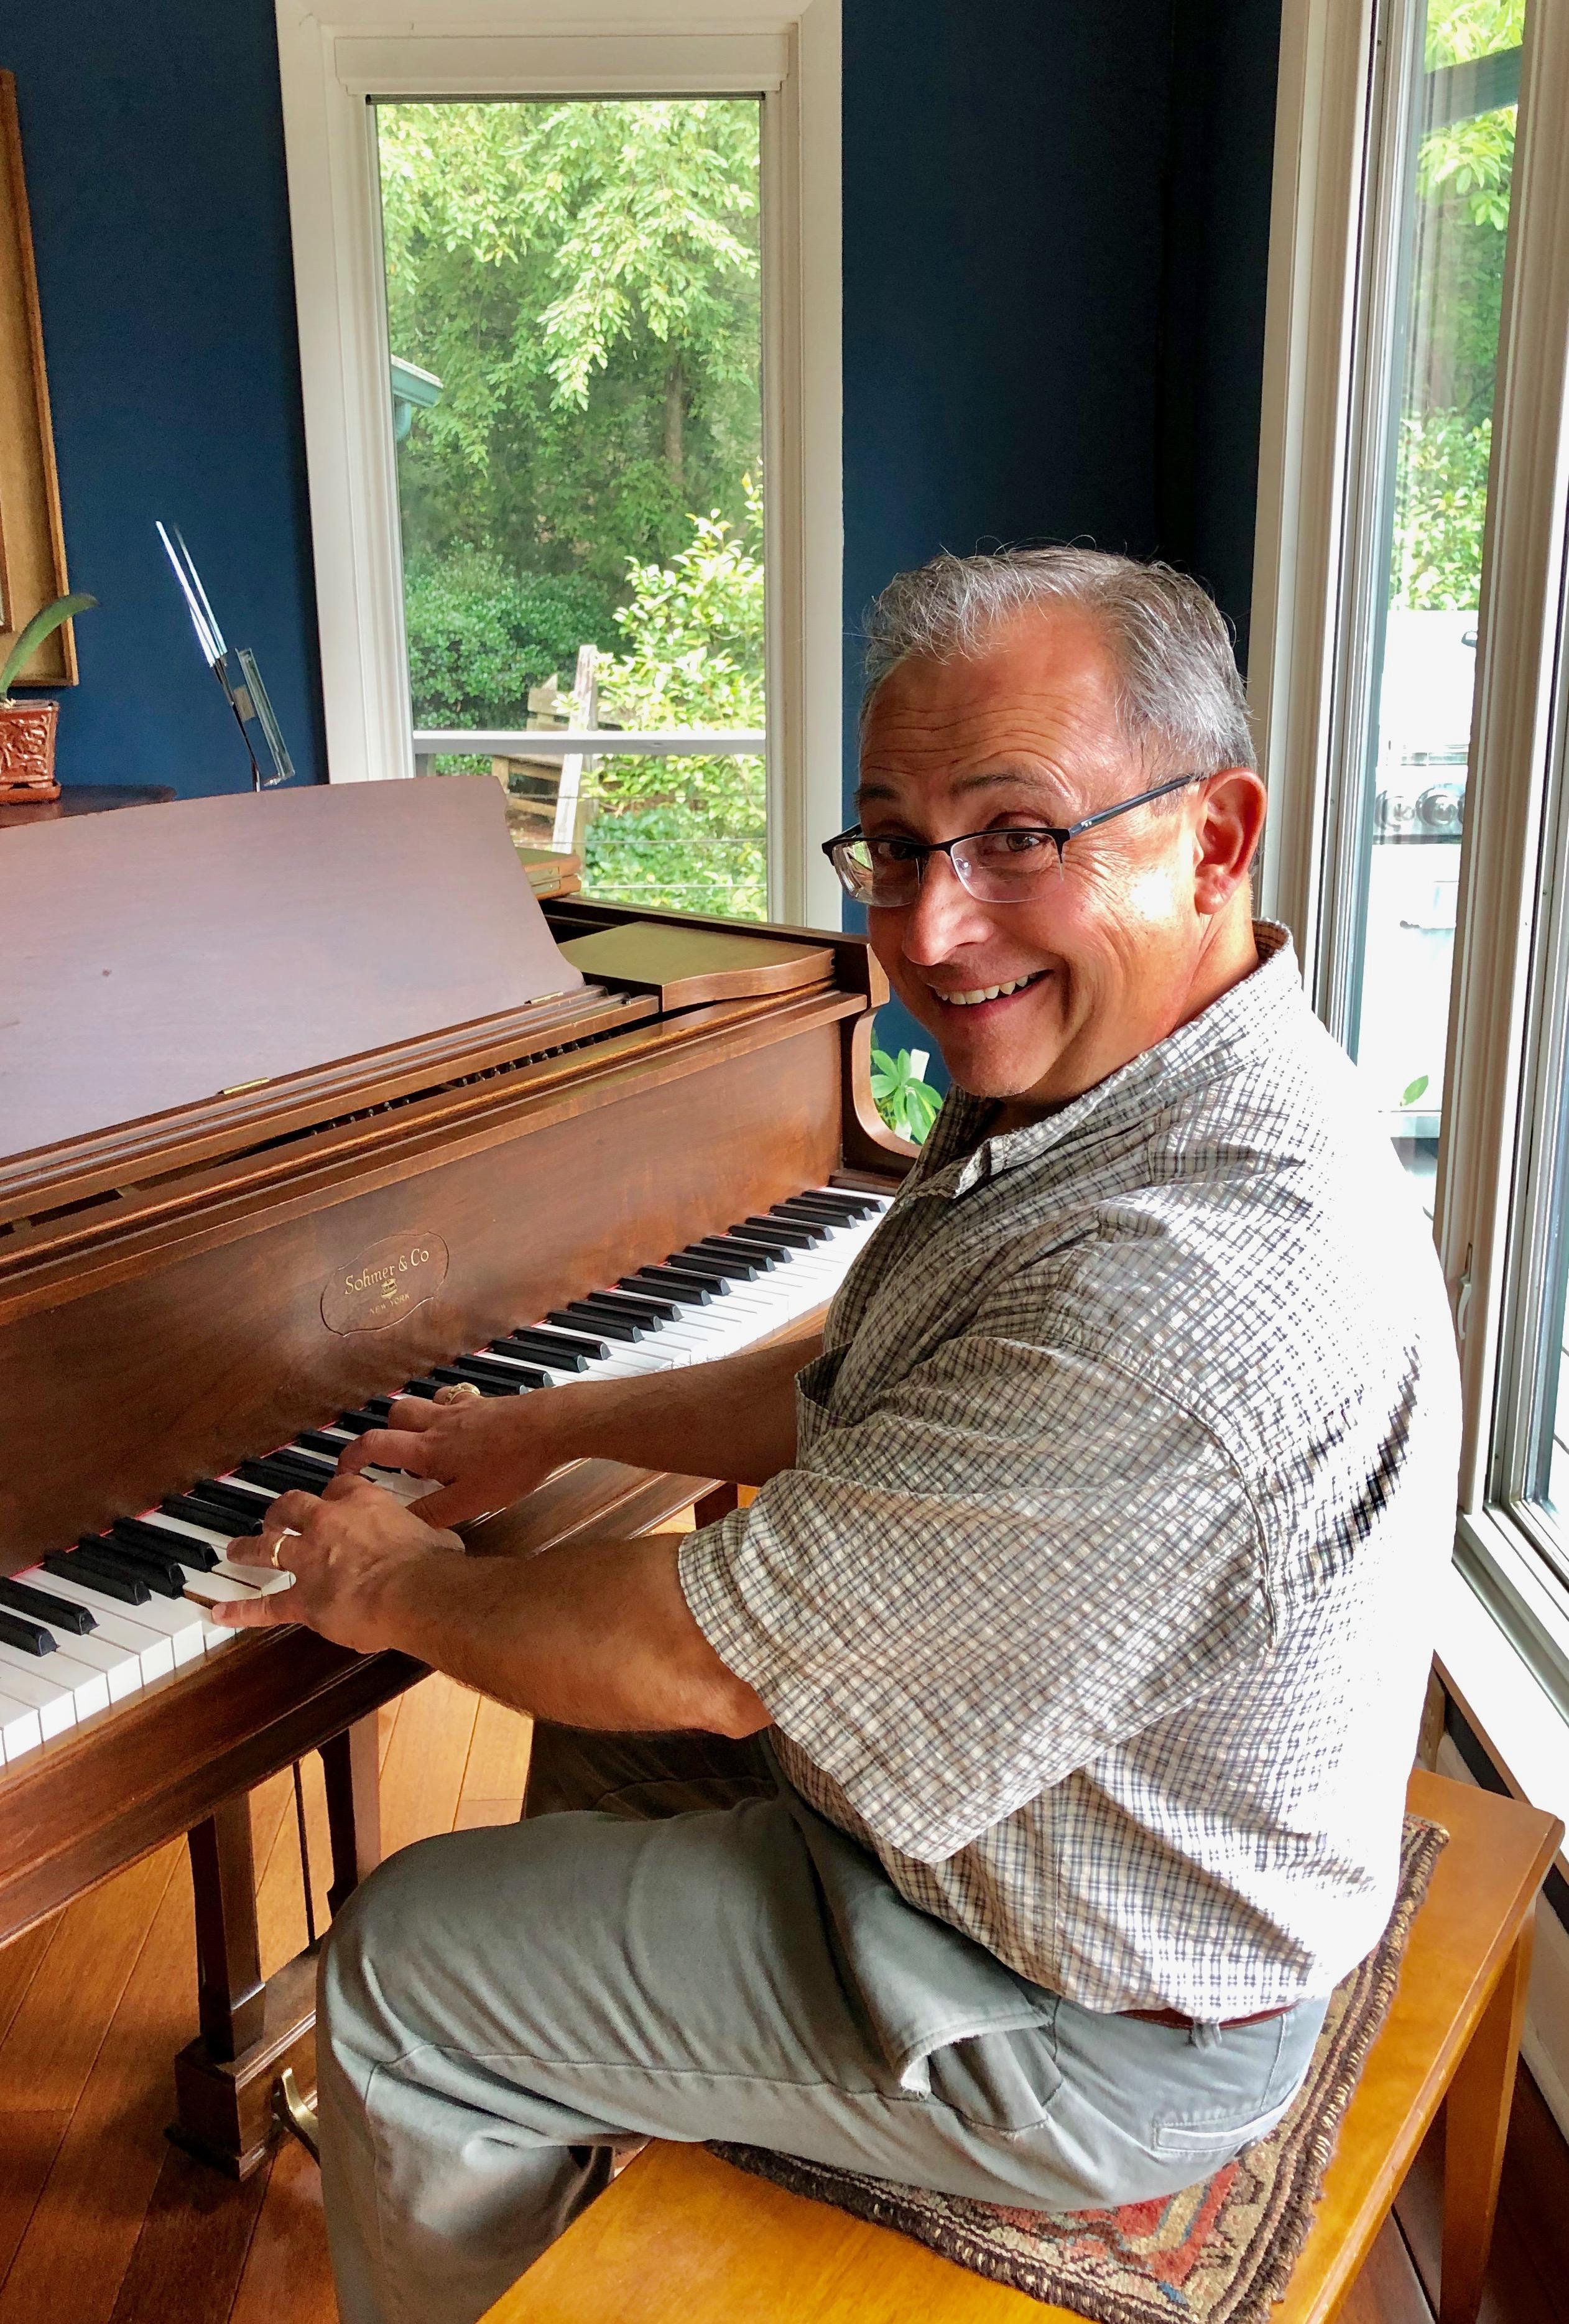 Piano Artistry by Dean Trakas